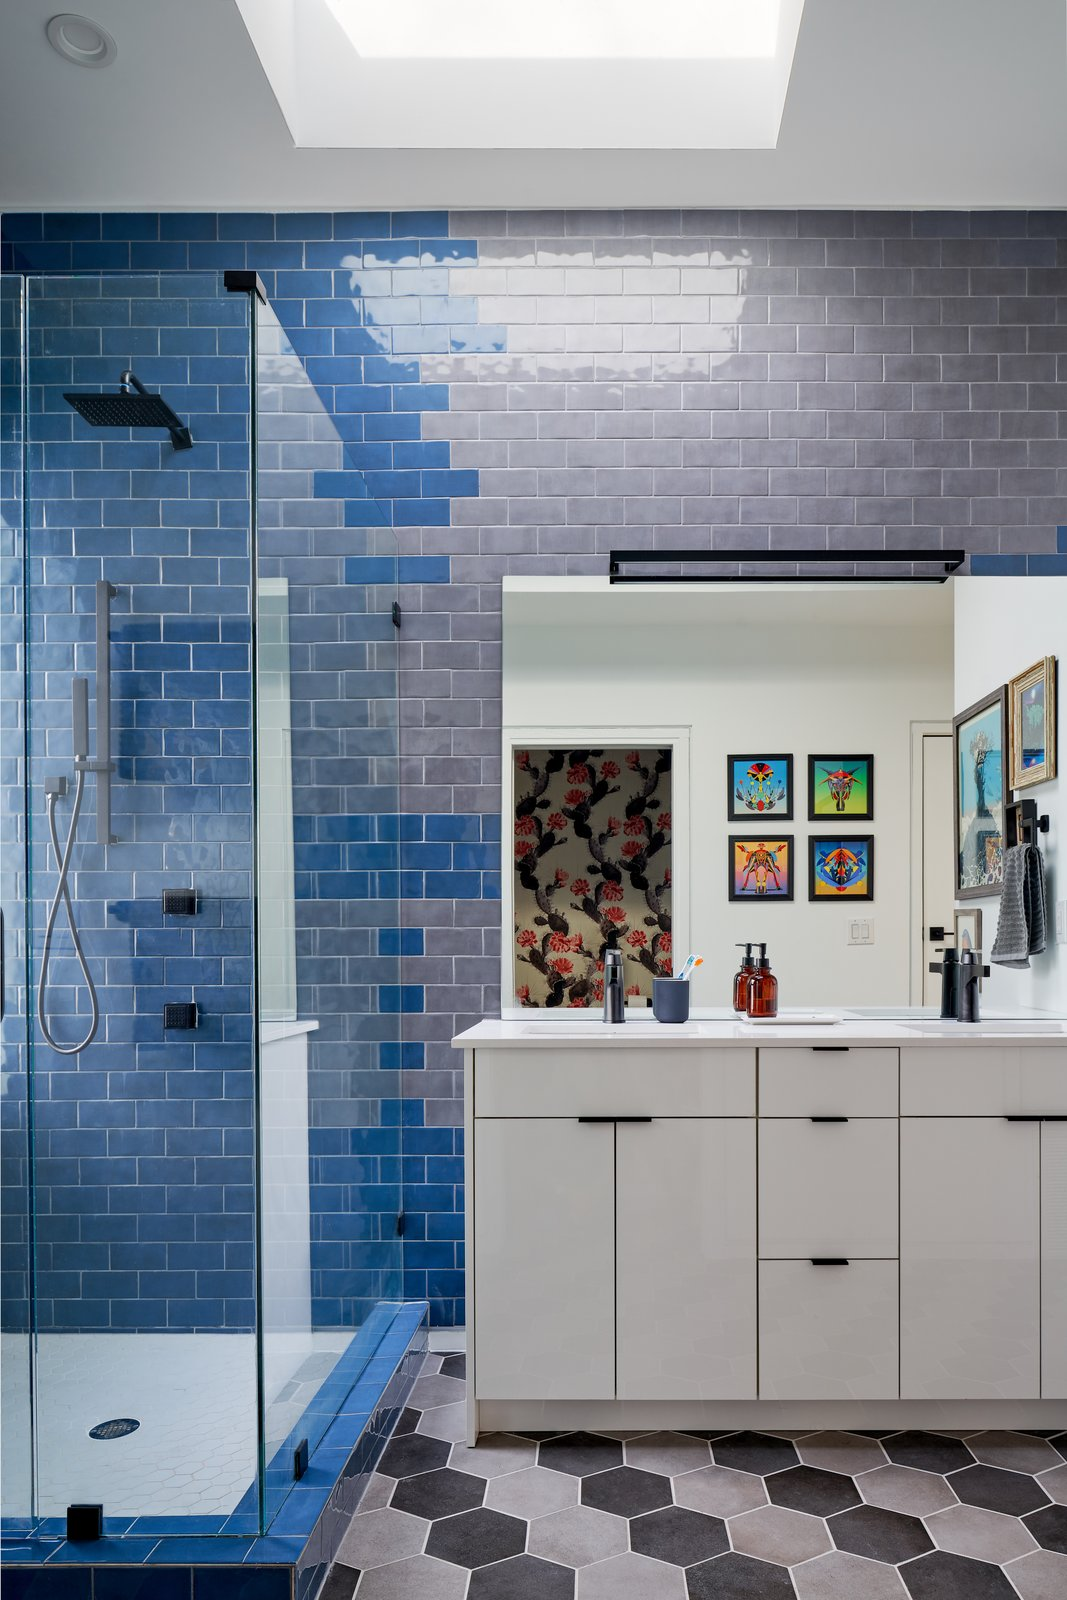 Maude Street House bathroom